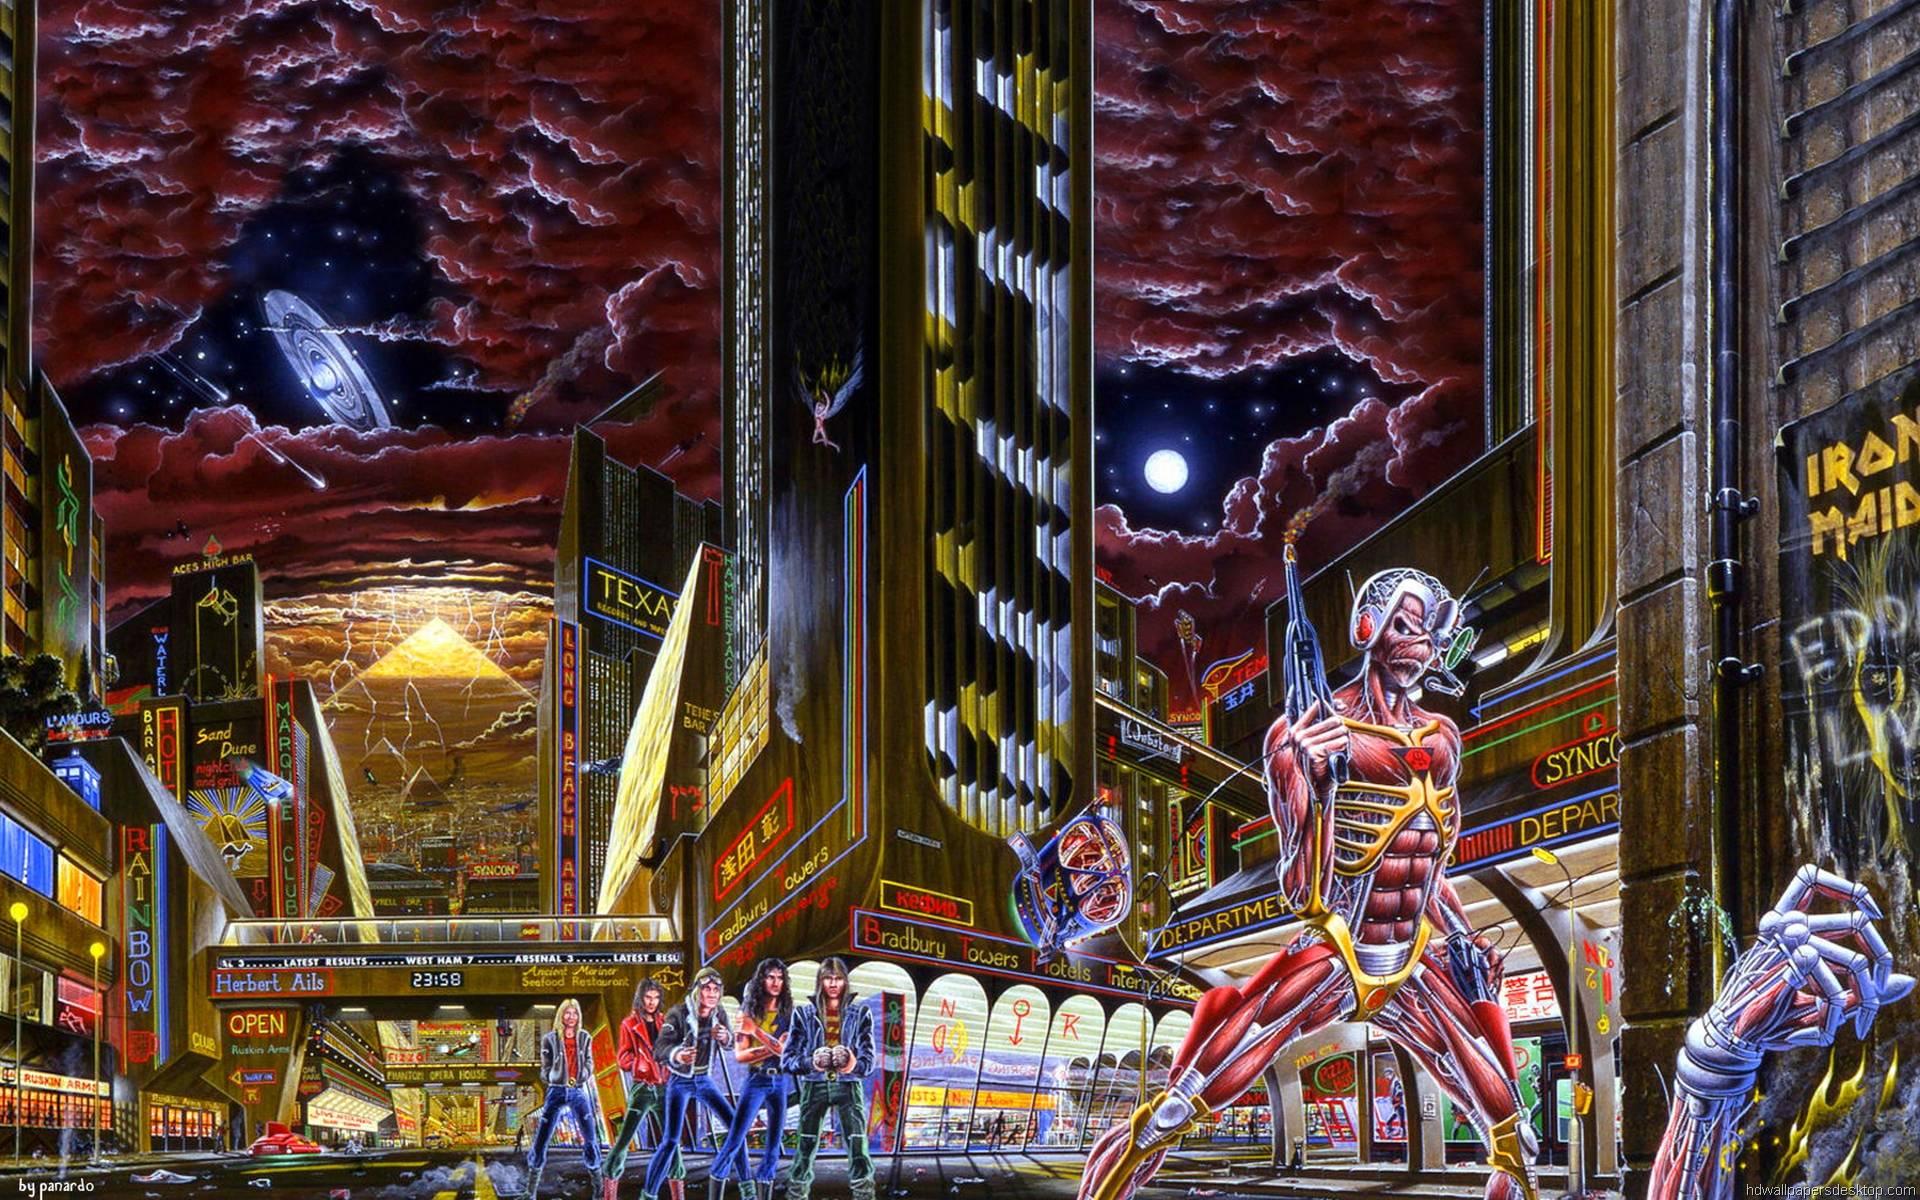 Iron Maiden Wallpapers Widescreen - Wallpaper Cave